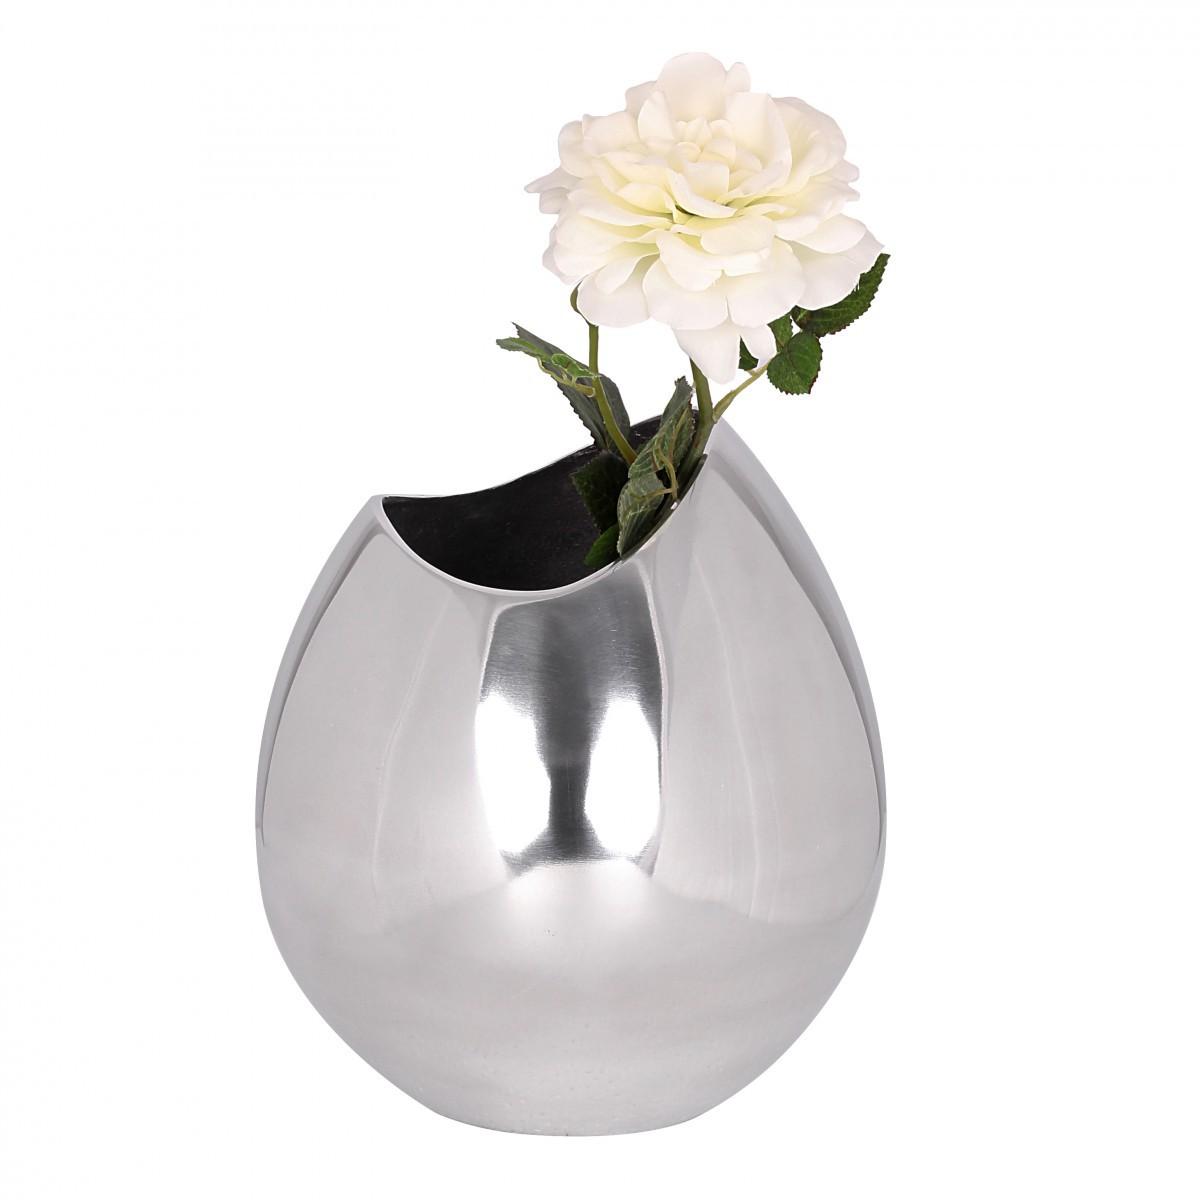 design deko vase tischvase aus aluminium blumenvase farbe silber neu ebay. Black Bedroom Furniture Sets. Home Design Ideas